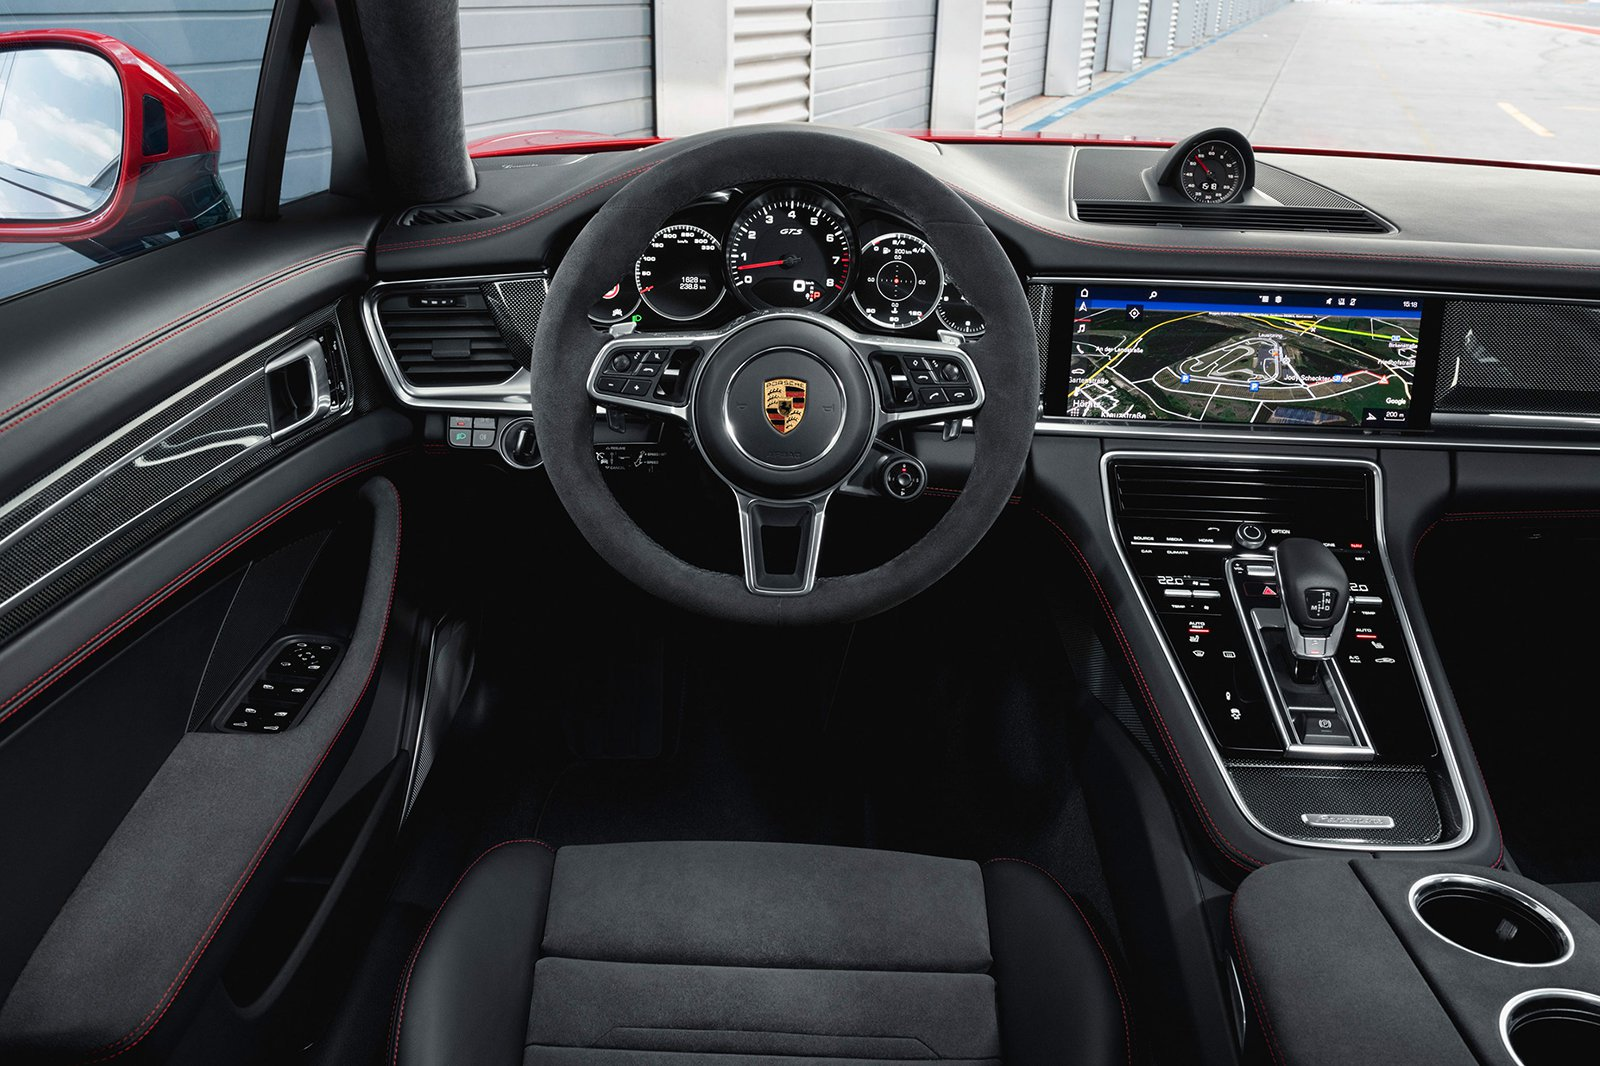 2019 Porsche Panamera GTS dash